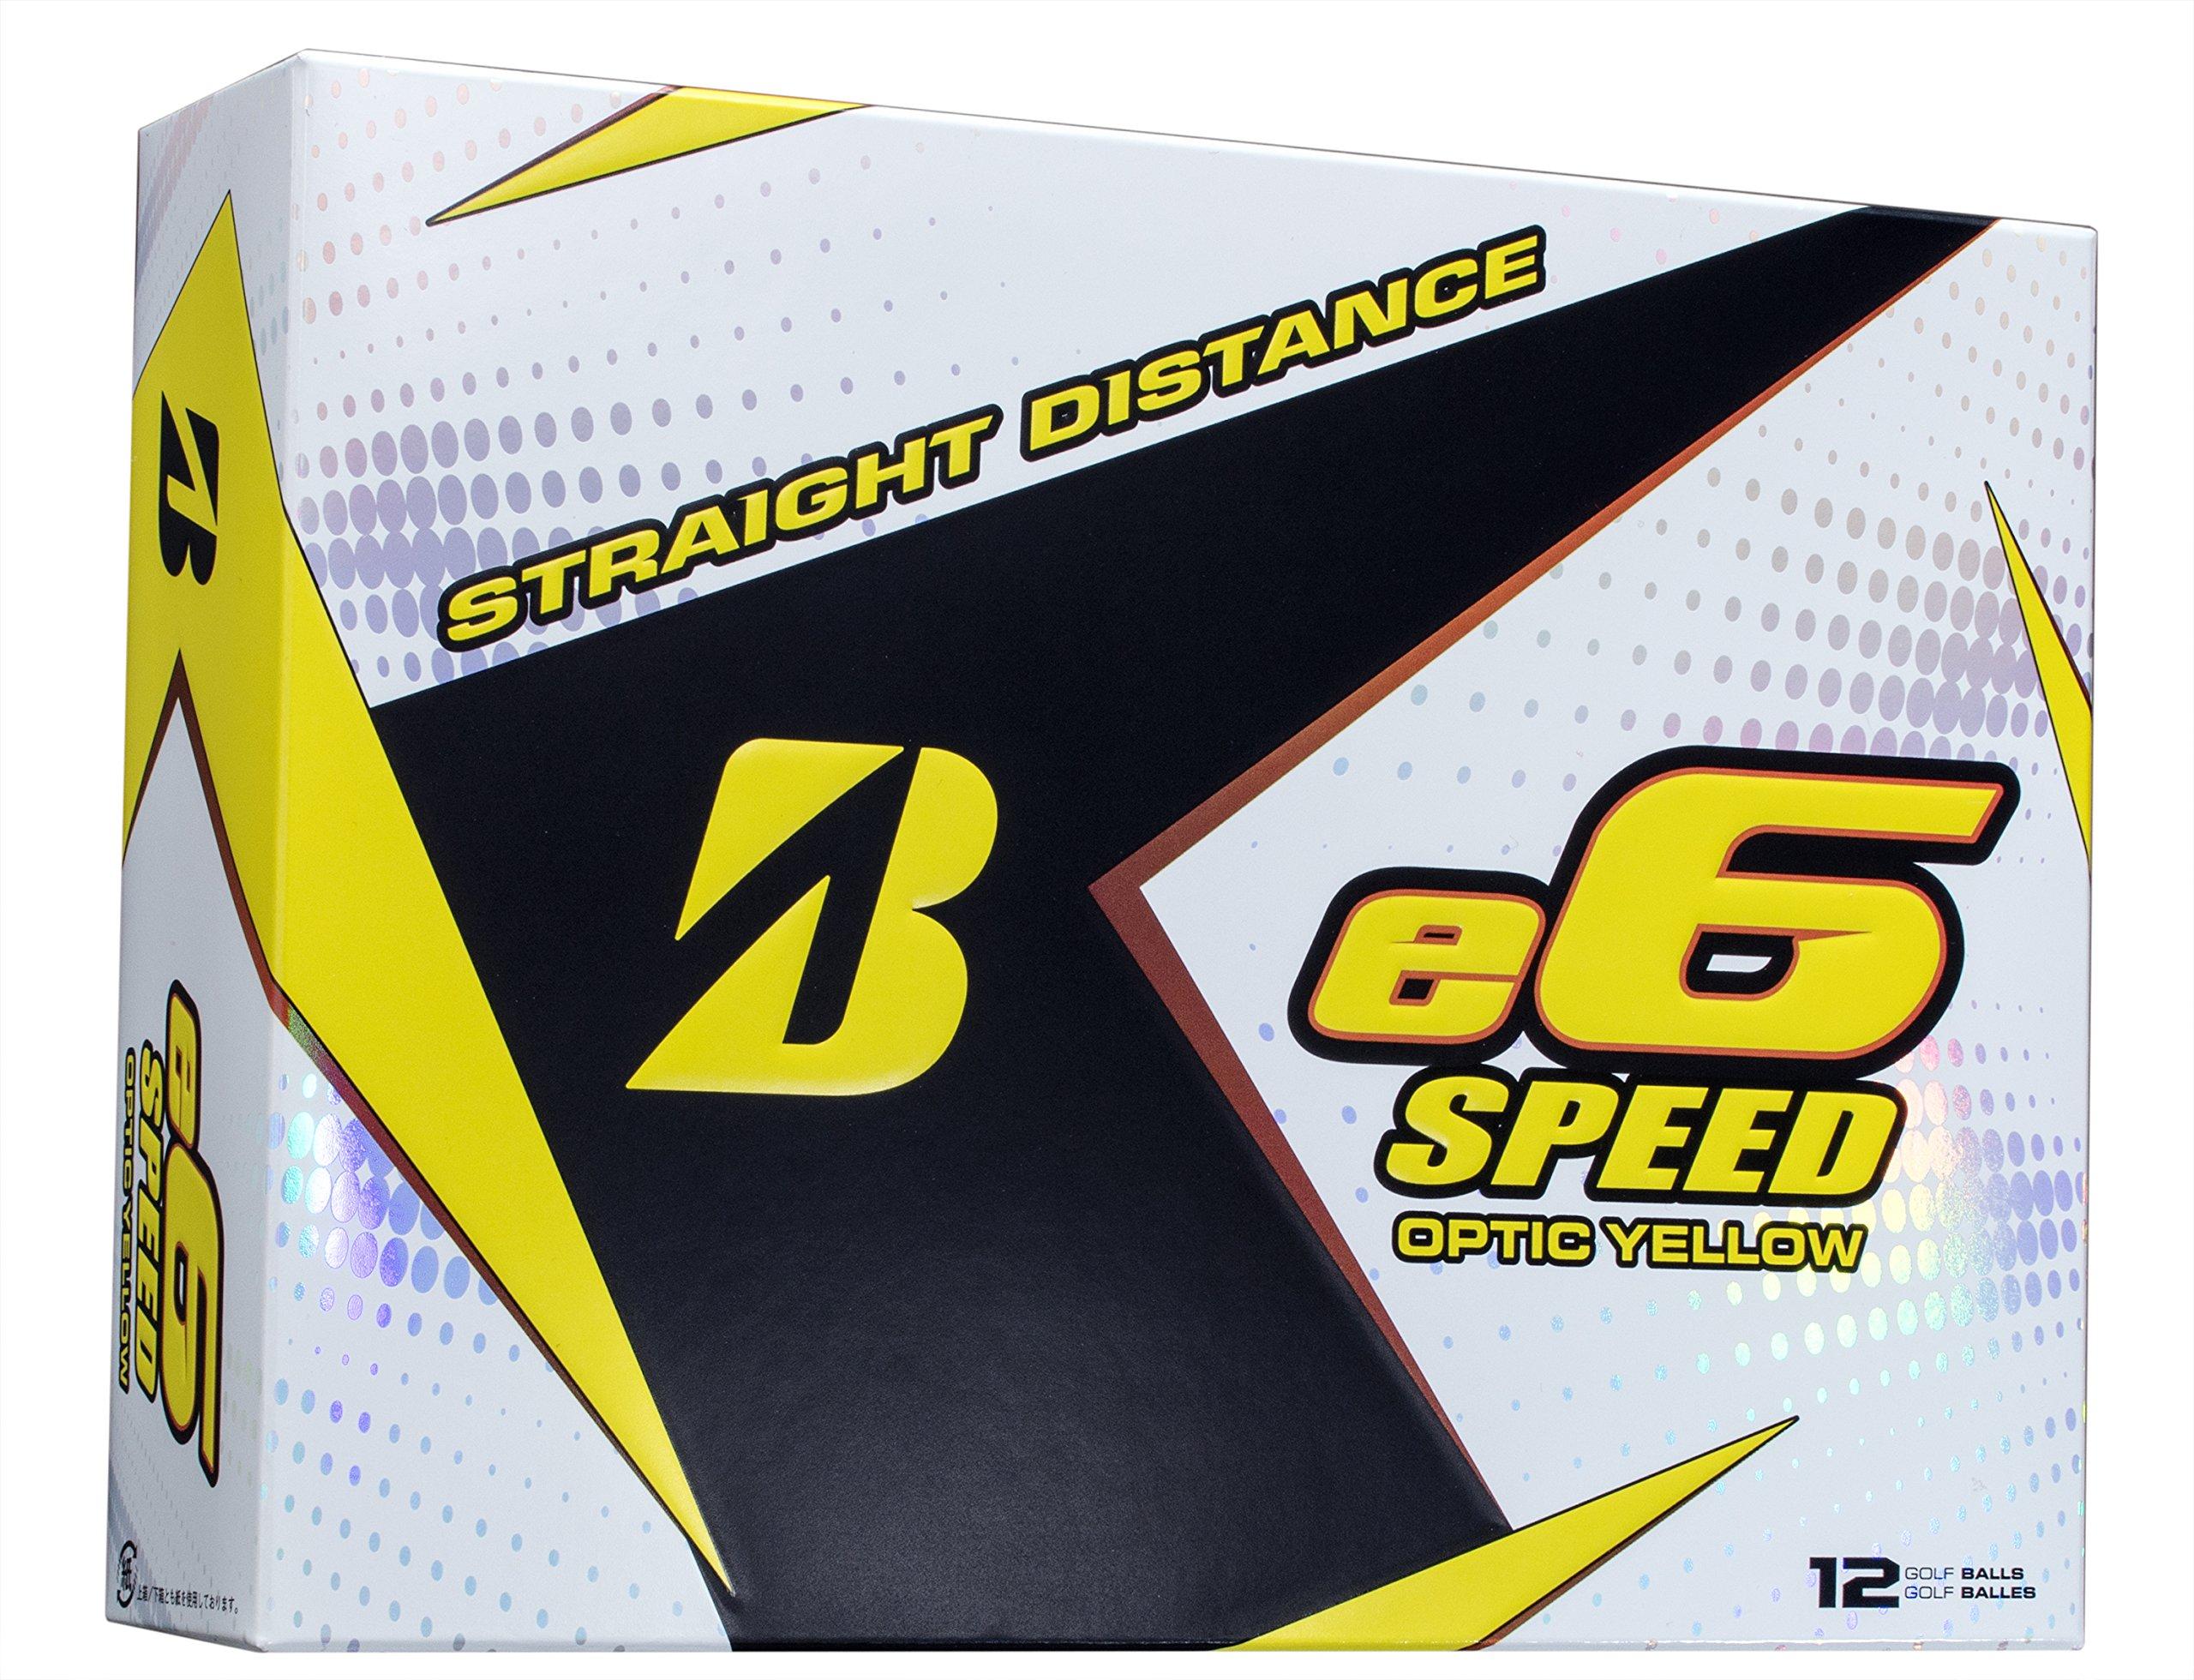 BRIDGESTONE GOLF e6 SPEED Golf Balls, Yellow, High-Performance (Dozen Golf Balls) by Bridgestone Golf